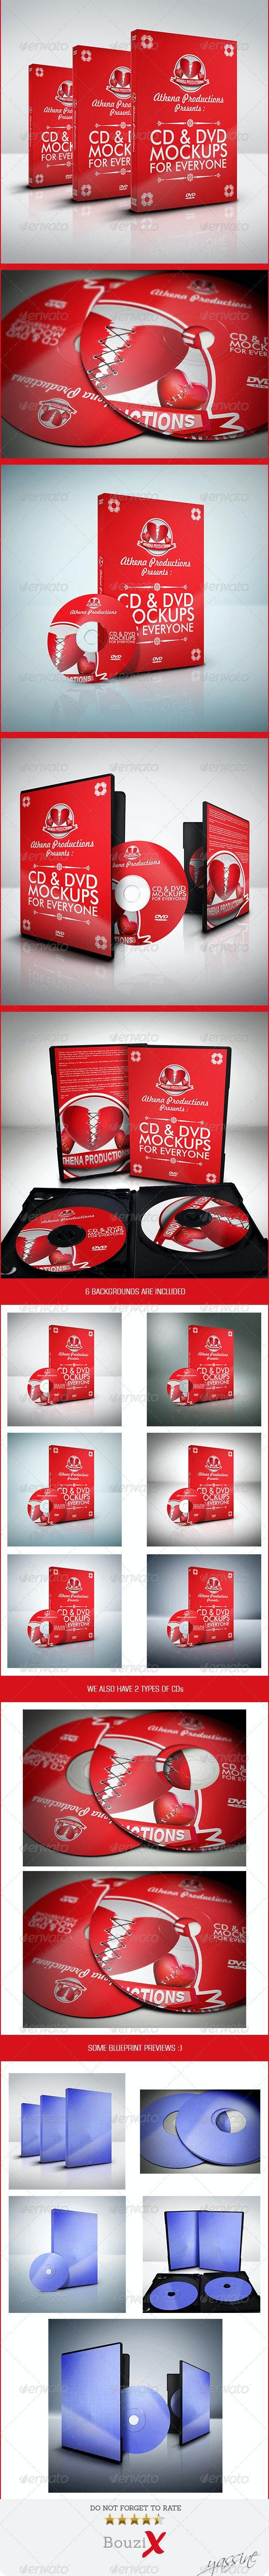 CD/DVD Mockups V.1 - Product Mock-Ups Graphics